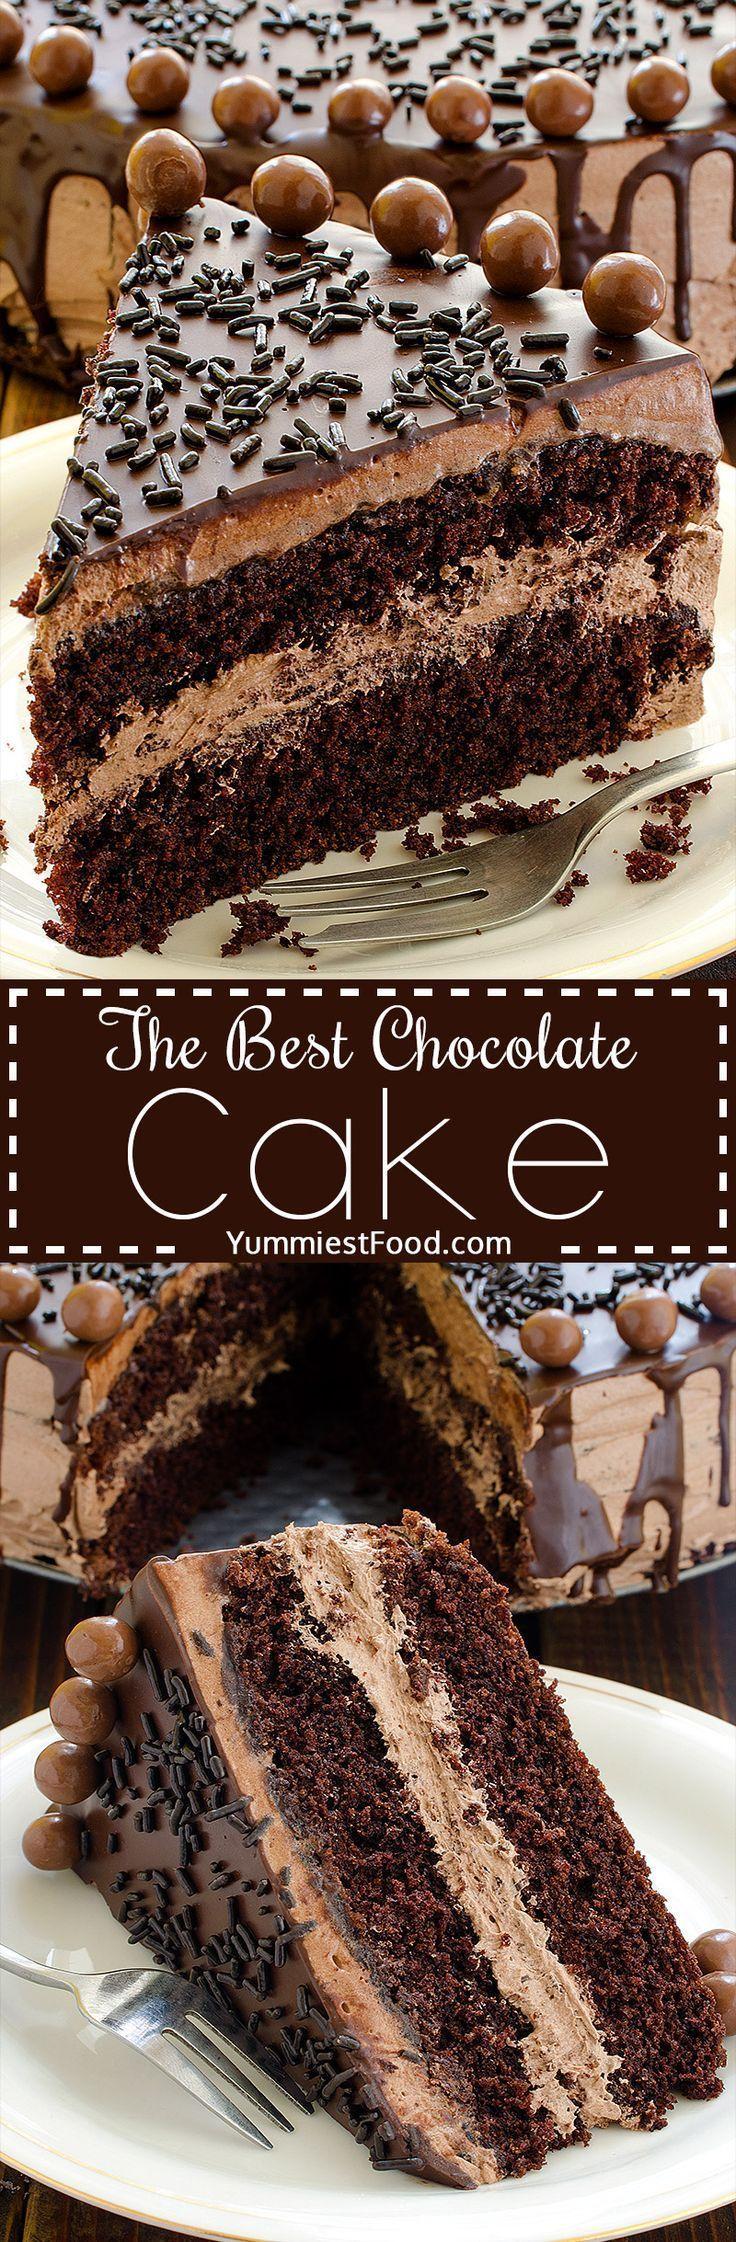 Best 25+ Best chocolate desserts ideas on Pinterest | Homemade ...